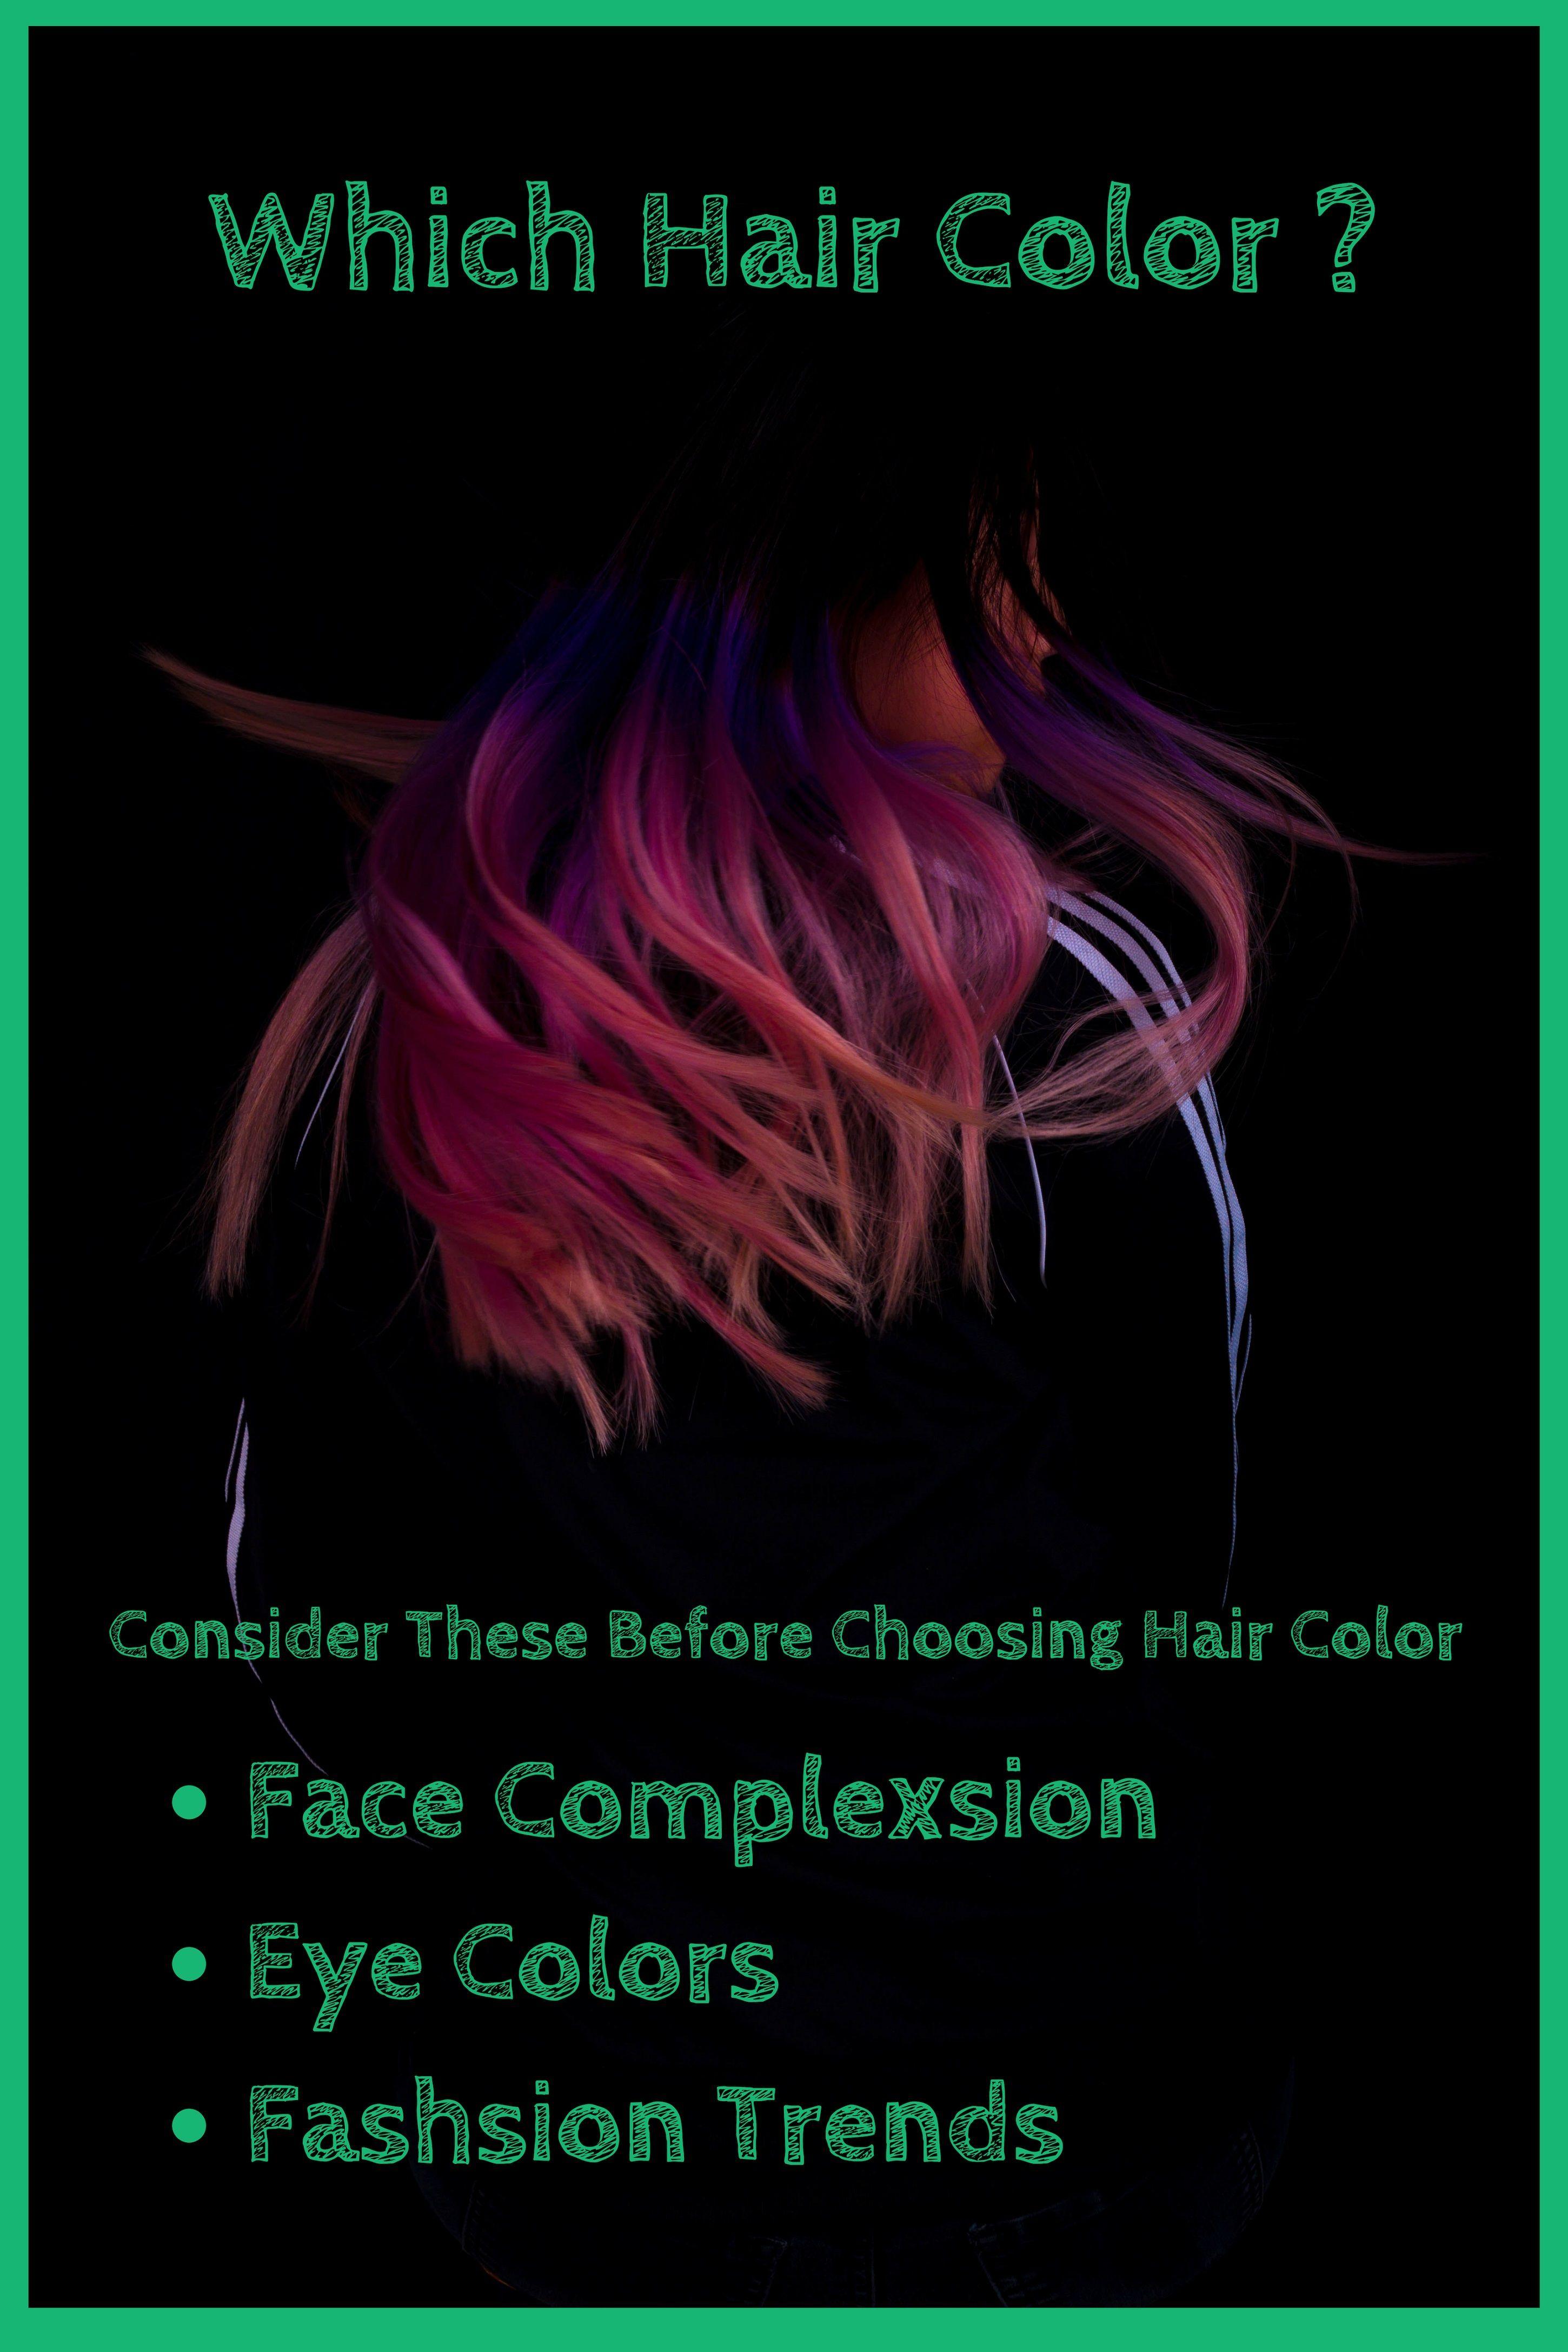 What Hair Color Looks Best On Me Choose Perfect Hair Color Perfect Hair Color Hair Color Quiz What Hair Color Suits Me Quiz